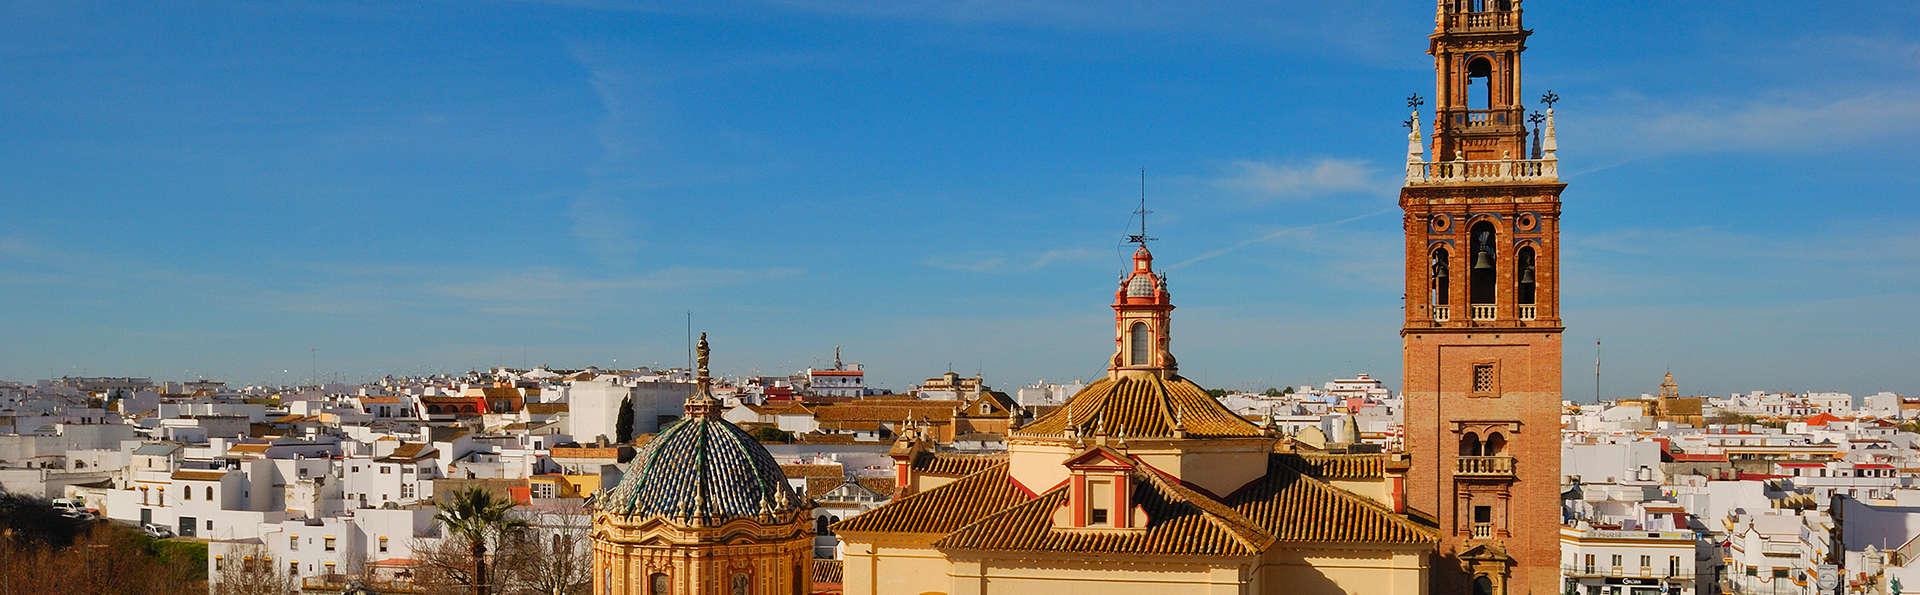 Casa Palacio de Carmona - EDIT_Destination_Carmona.jpg